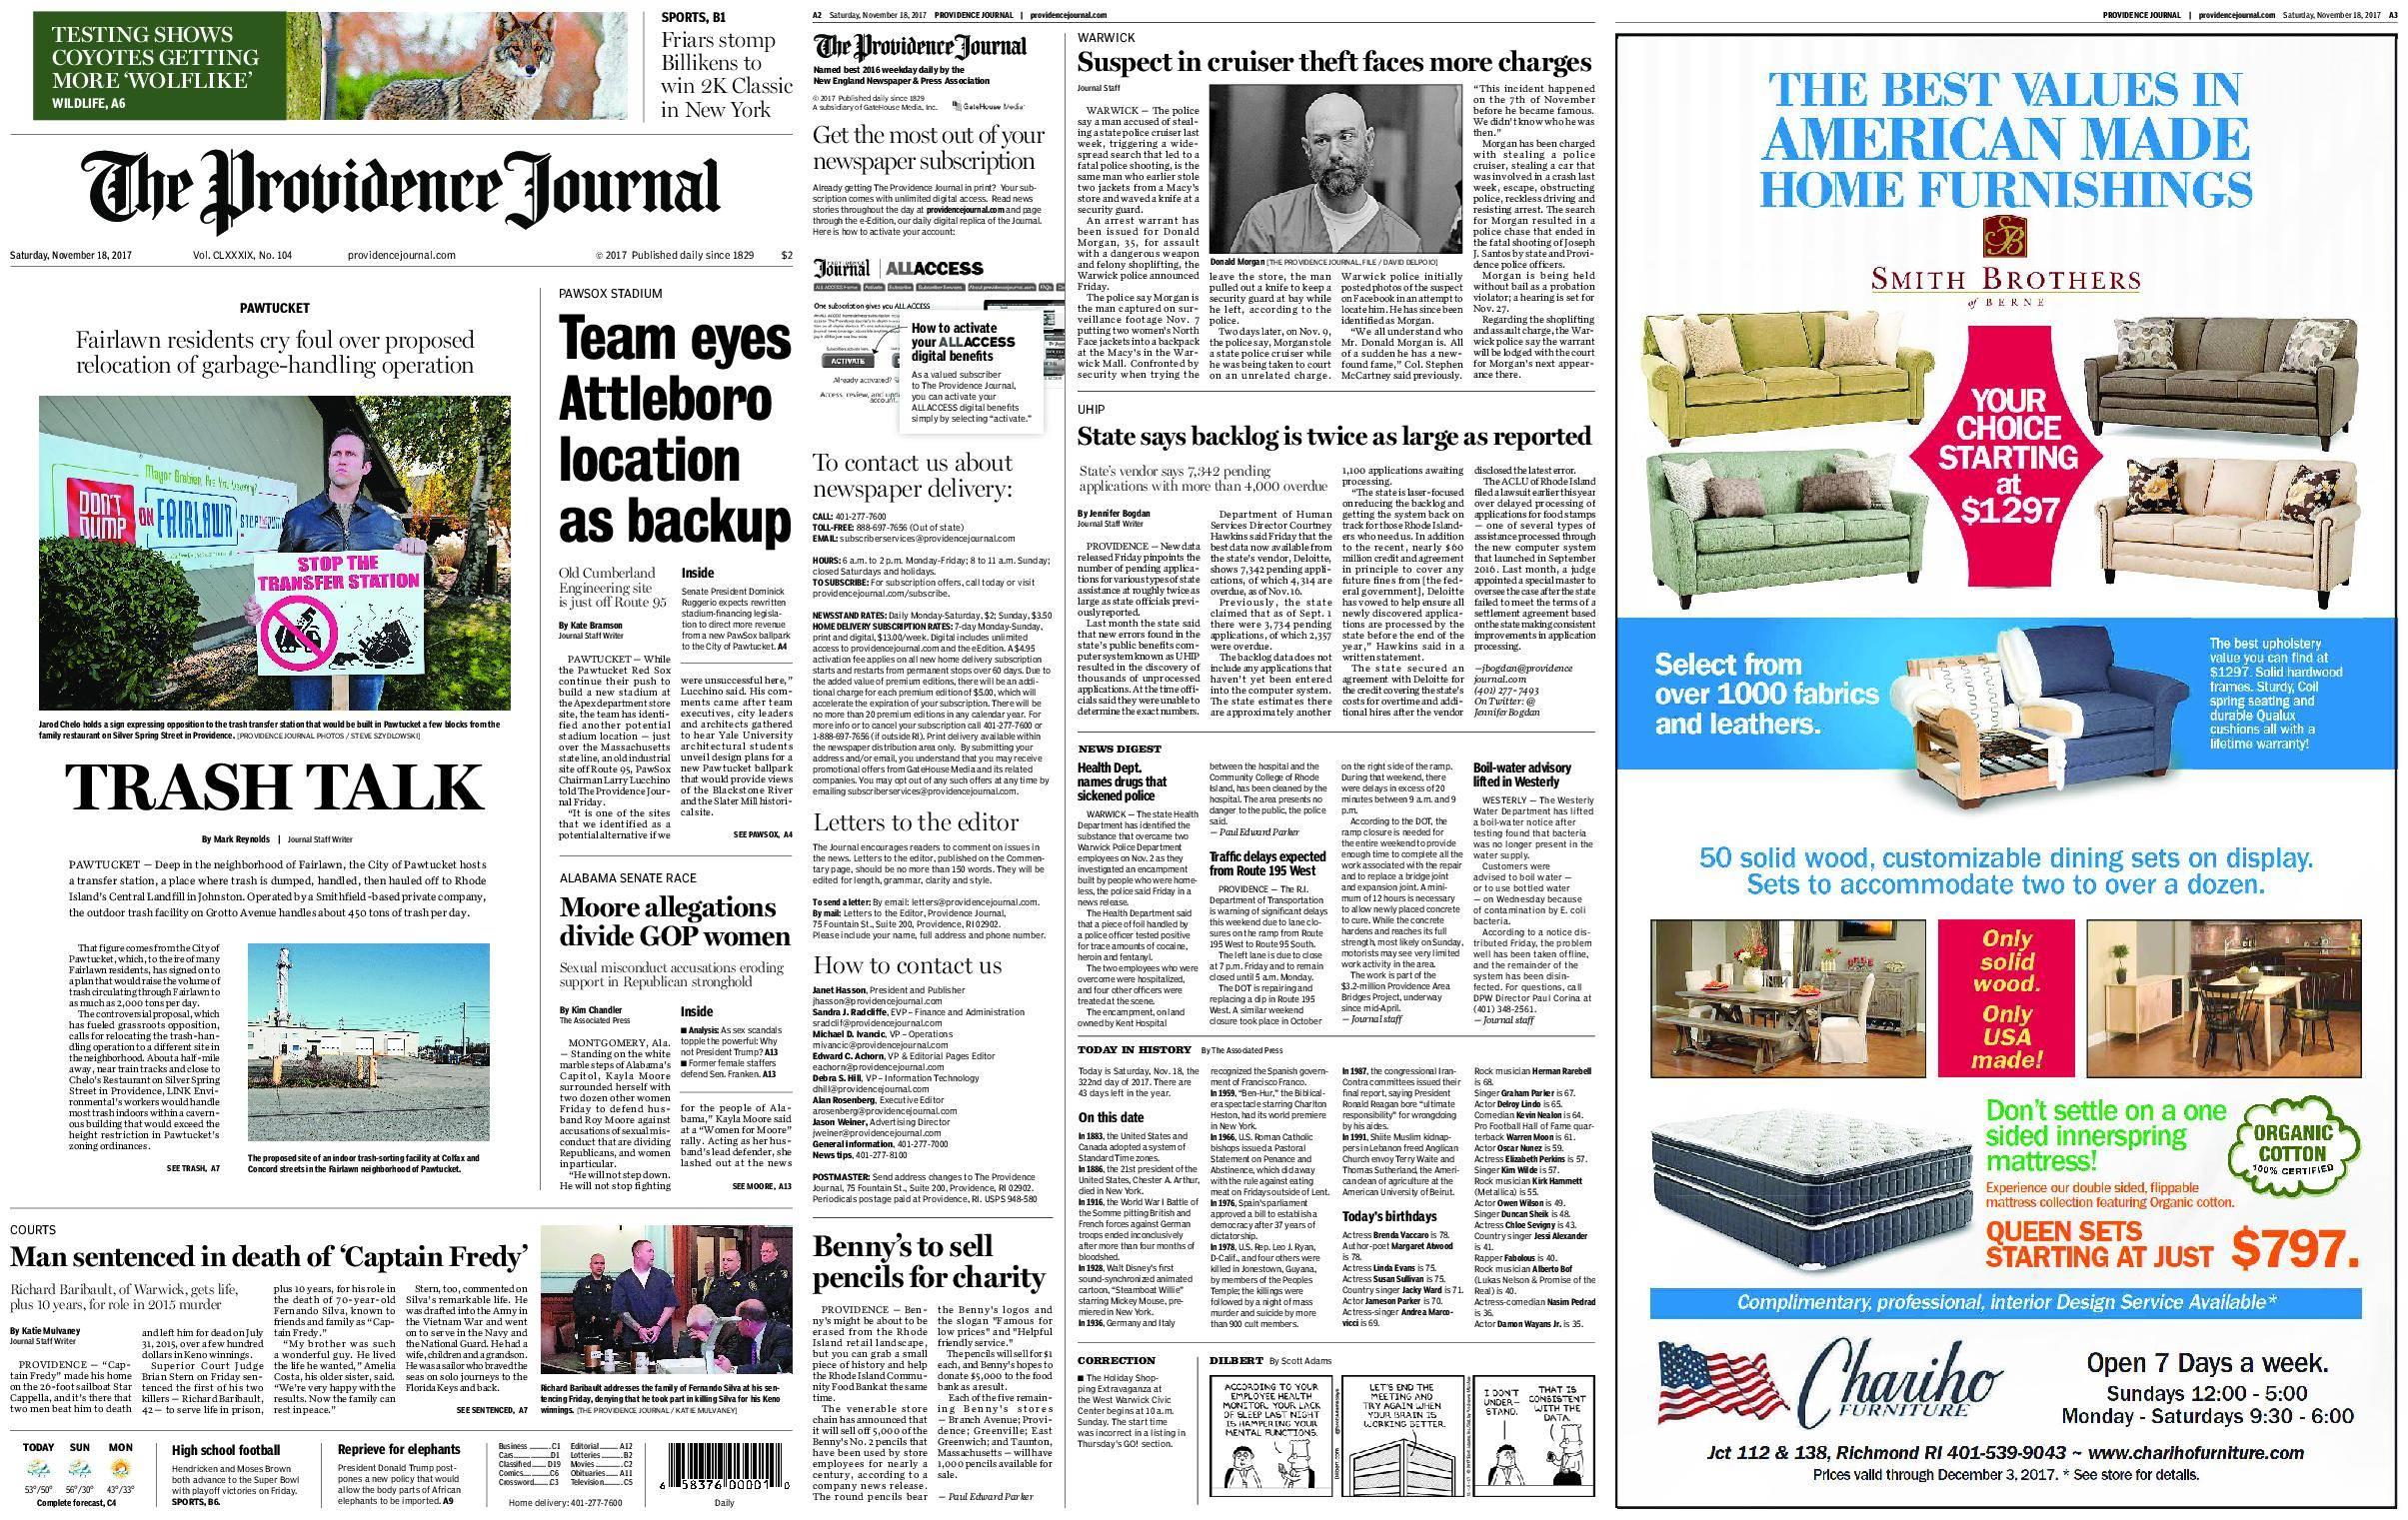 The Providence Journal – November 18, 2017 / AvaxHome